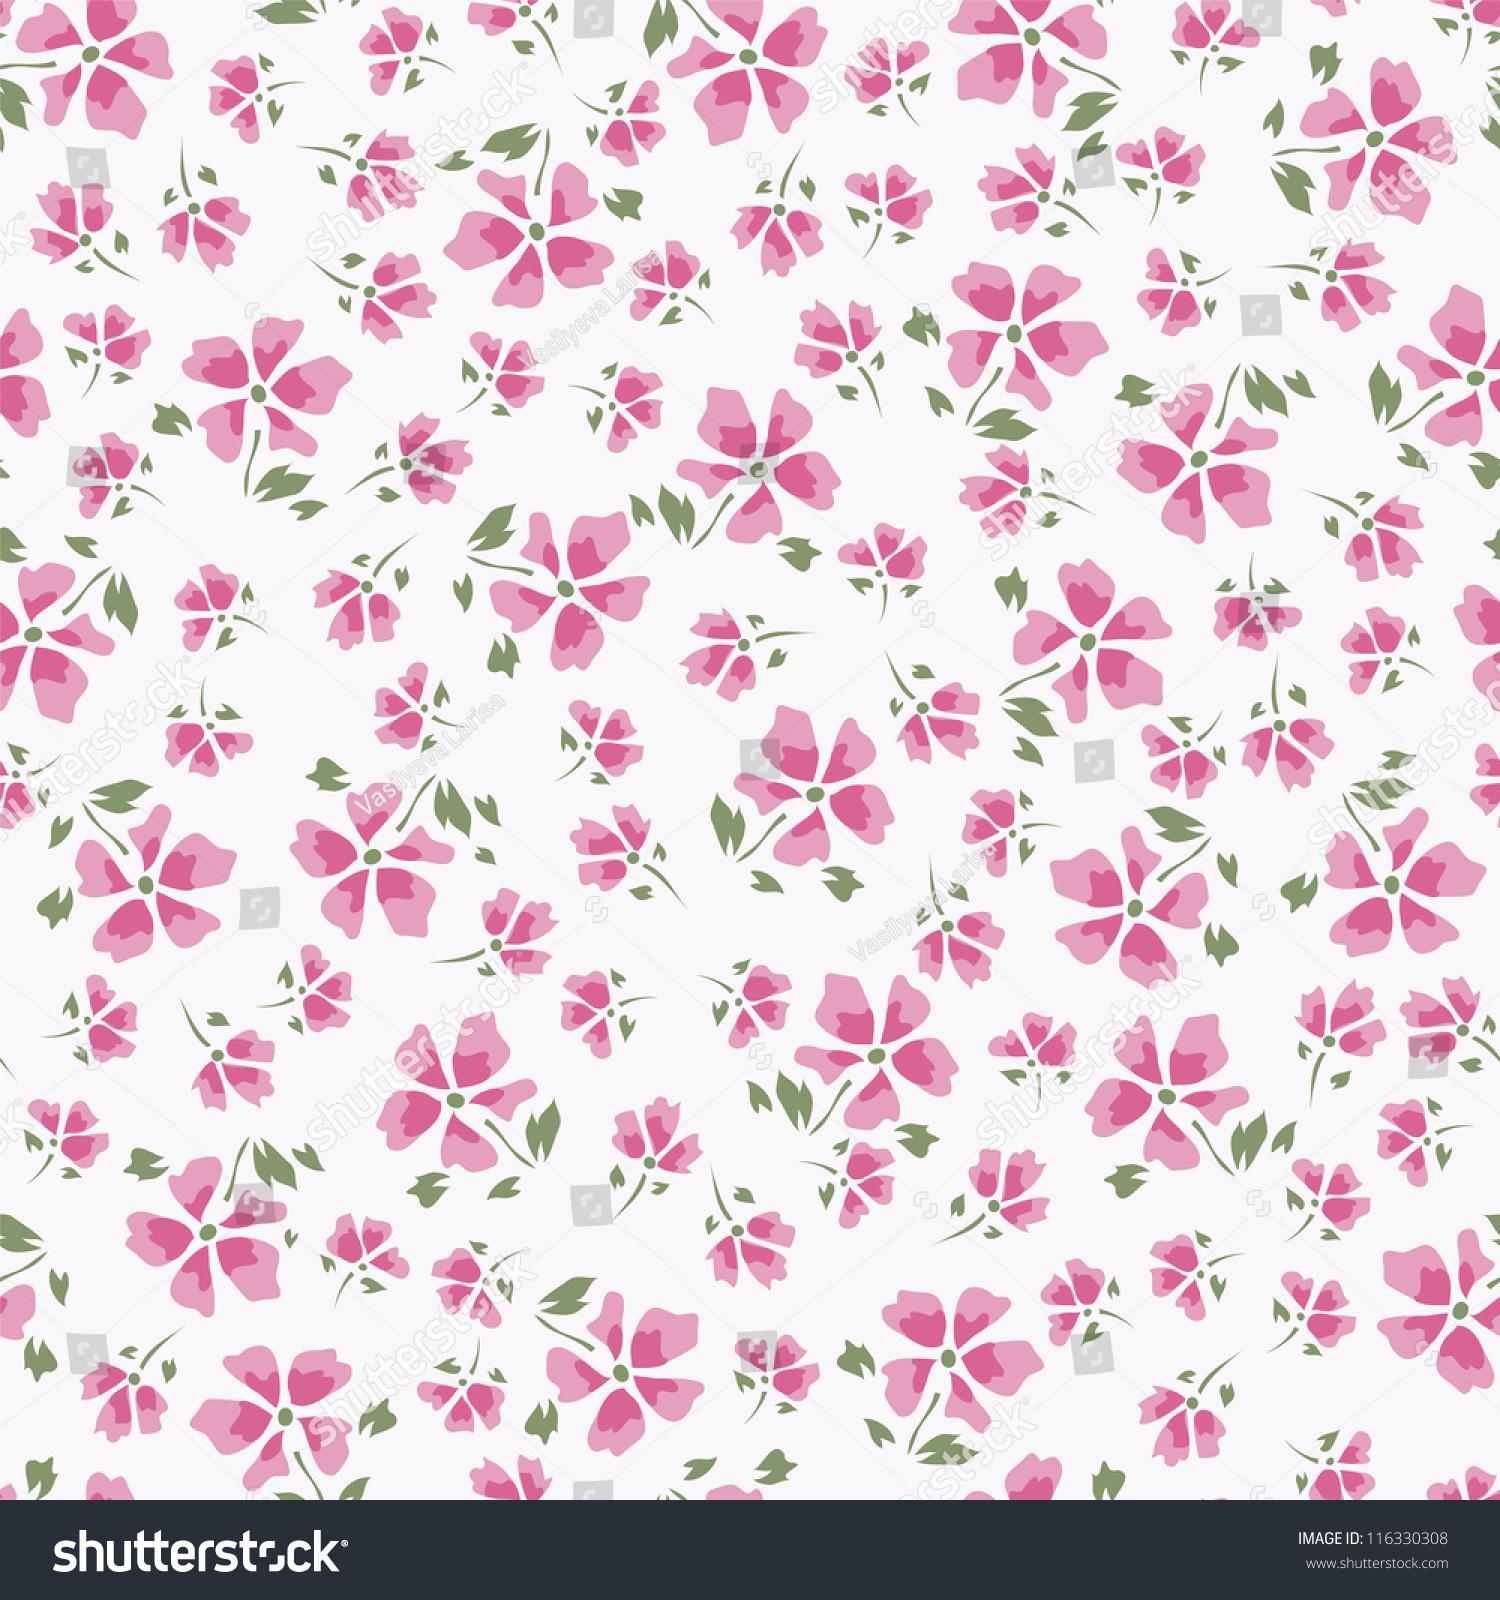 Simple flower pattern background